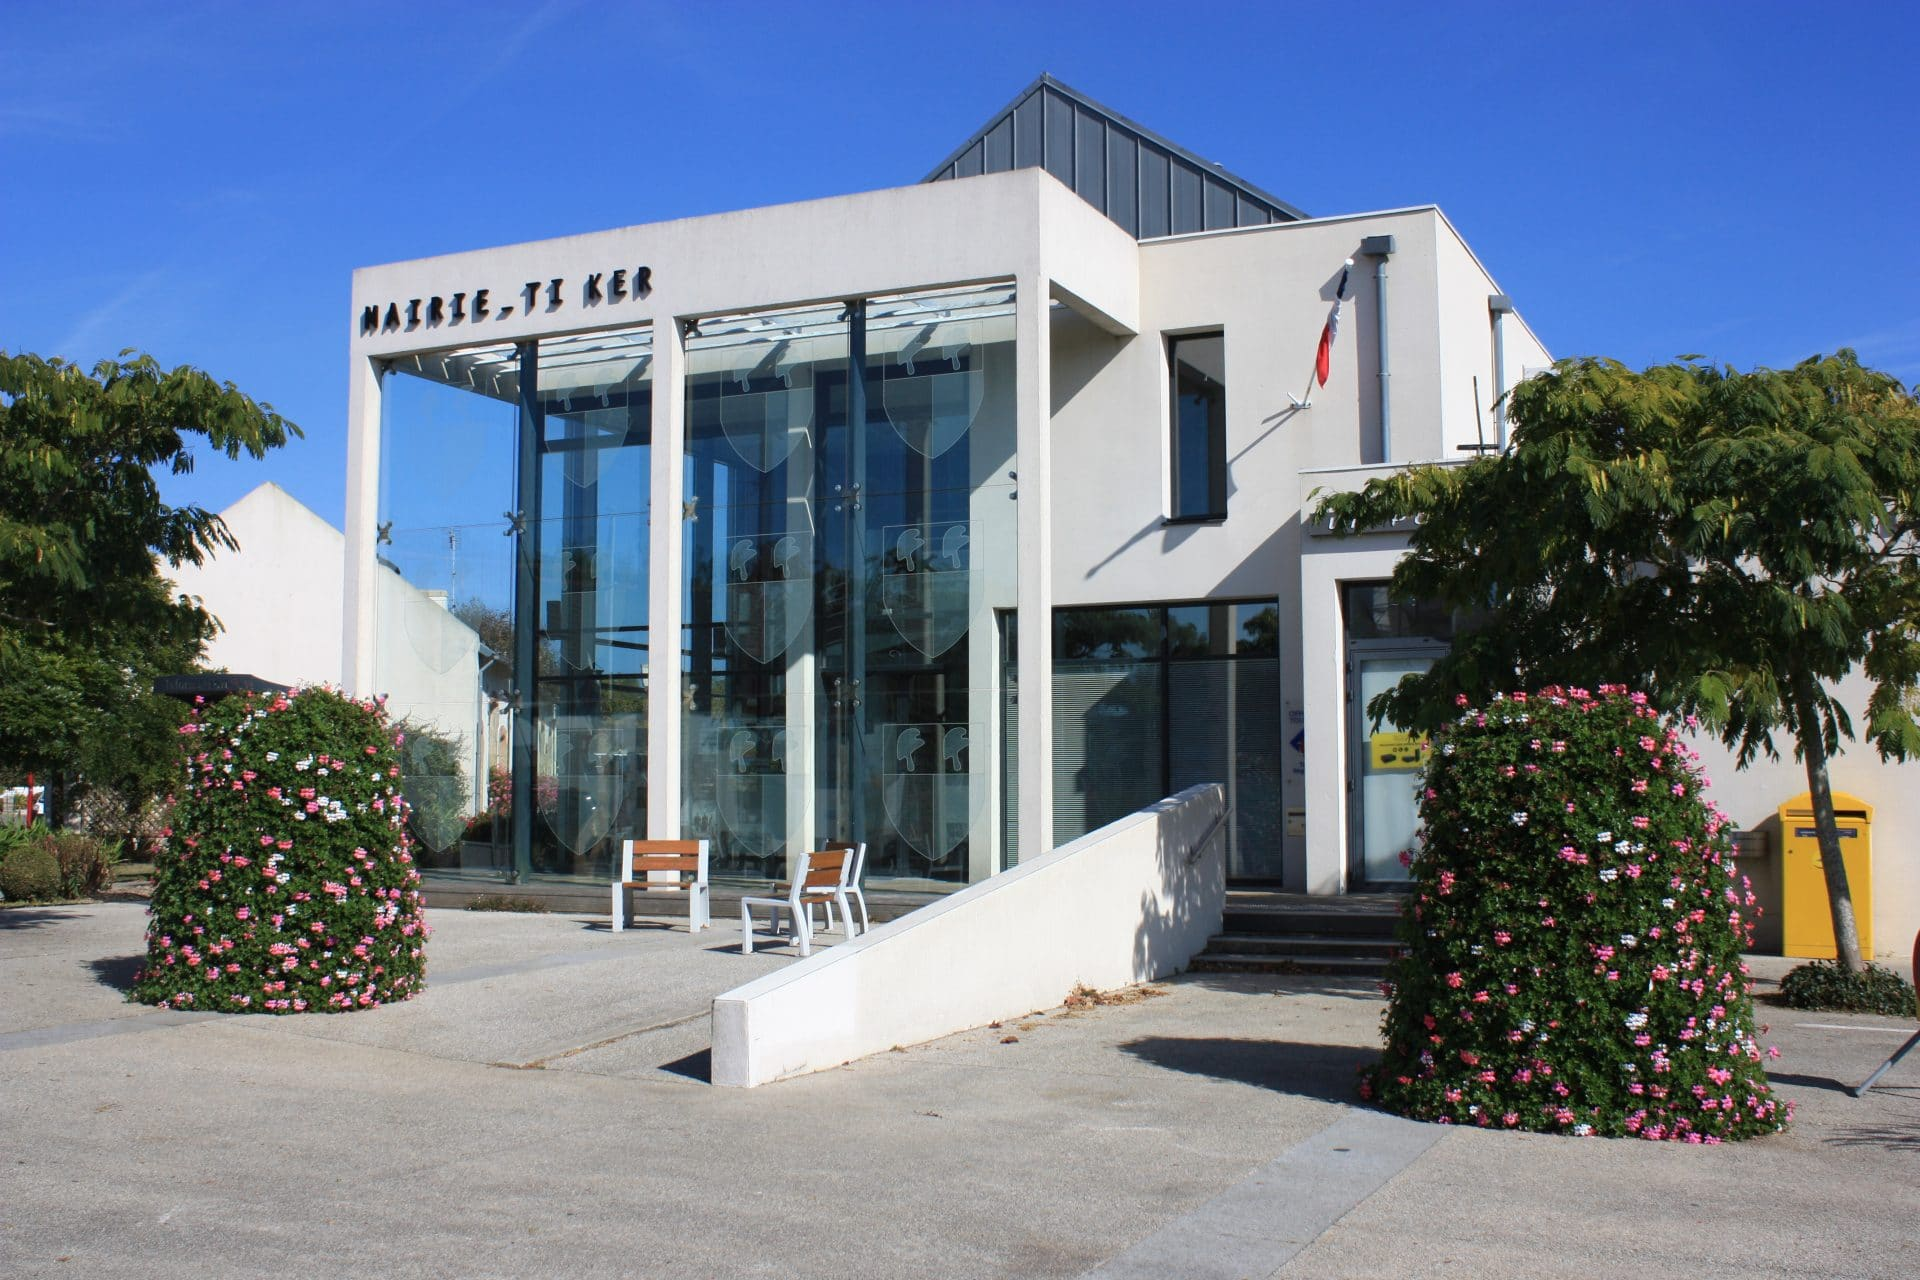 plomeur-Photo-mairie